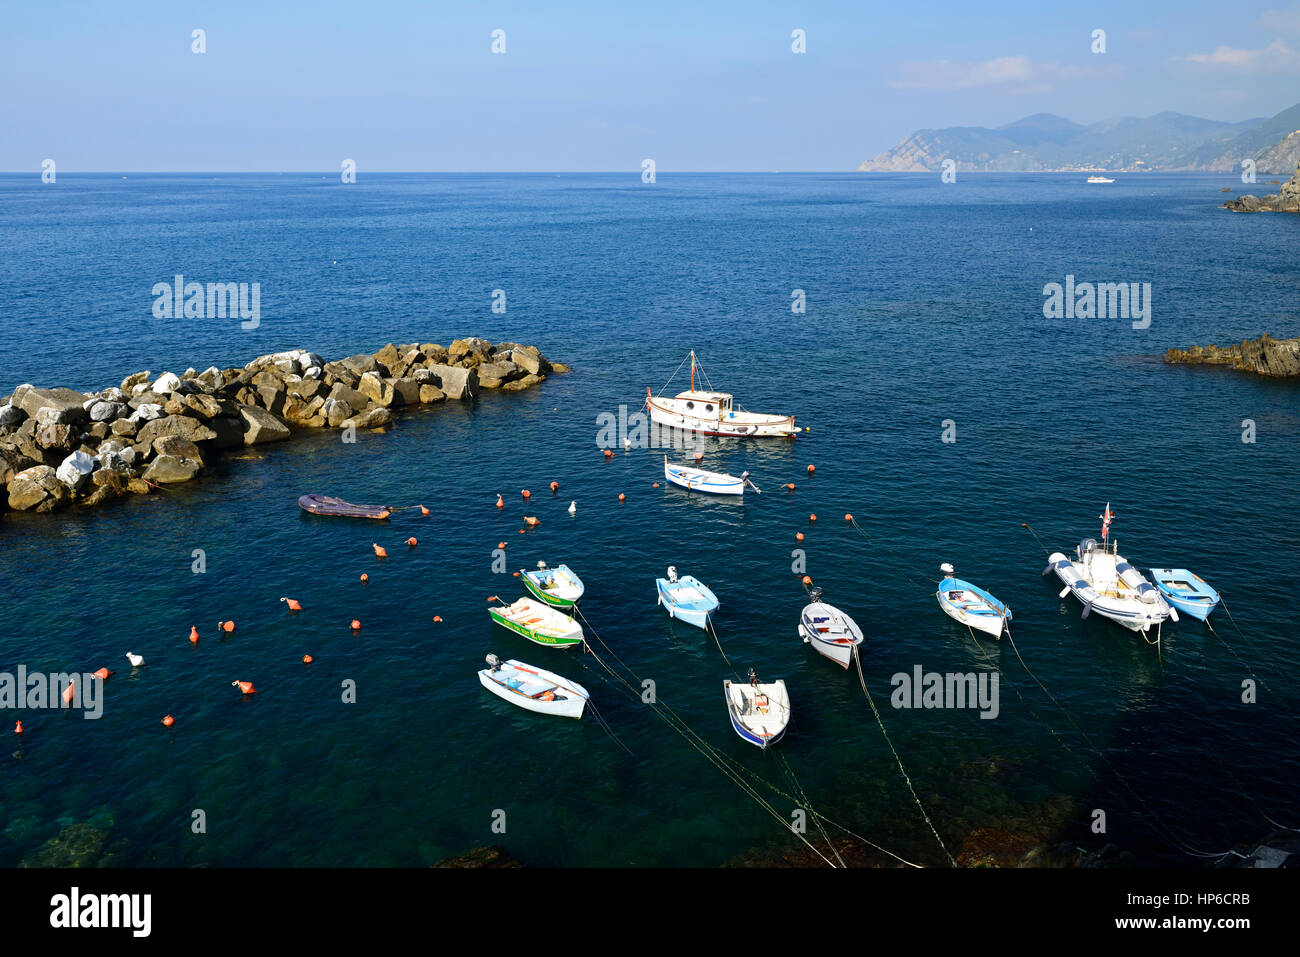 fishing boats, moor, moored, anchored, tied up, Riomaggiore, Cinque Terre, Coast, Coastline, UNESCO World Heritage Stock Photo